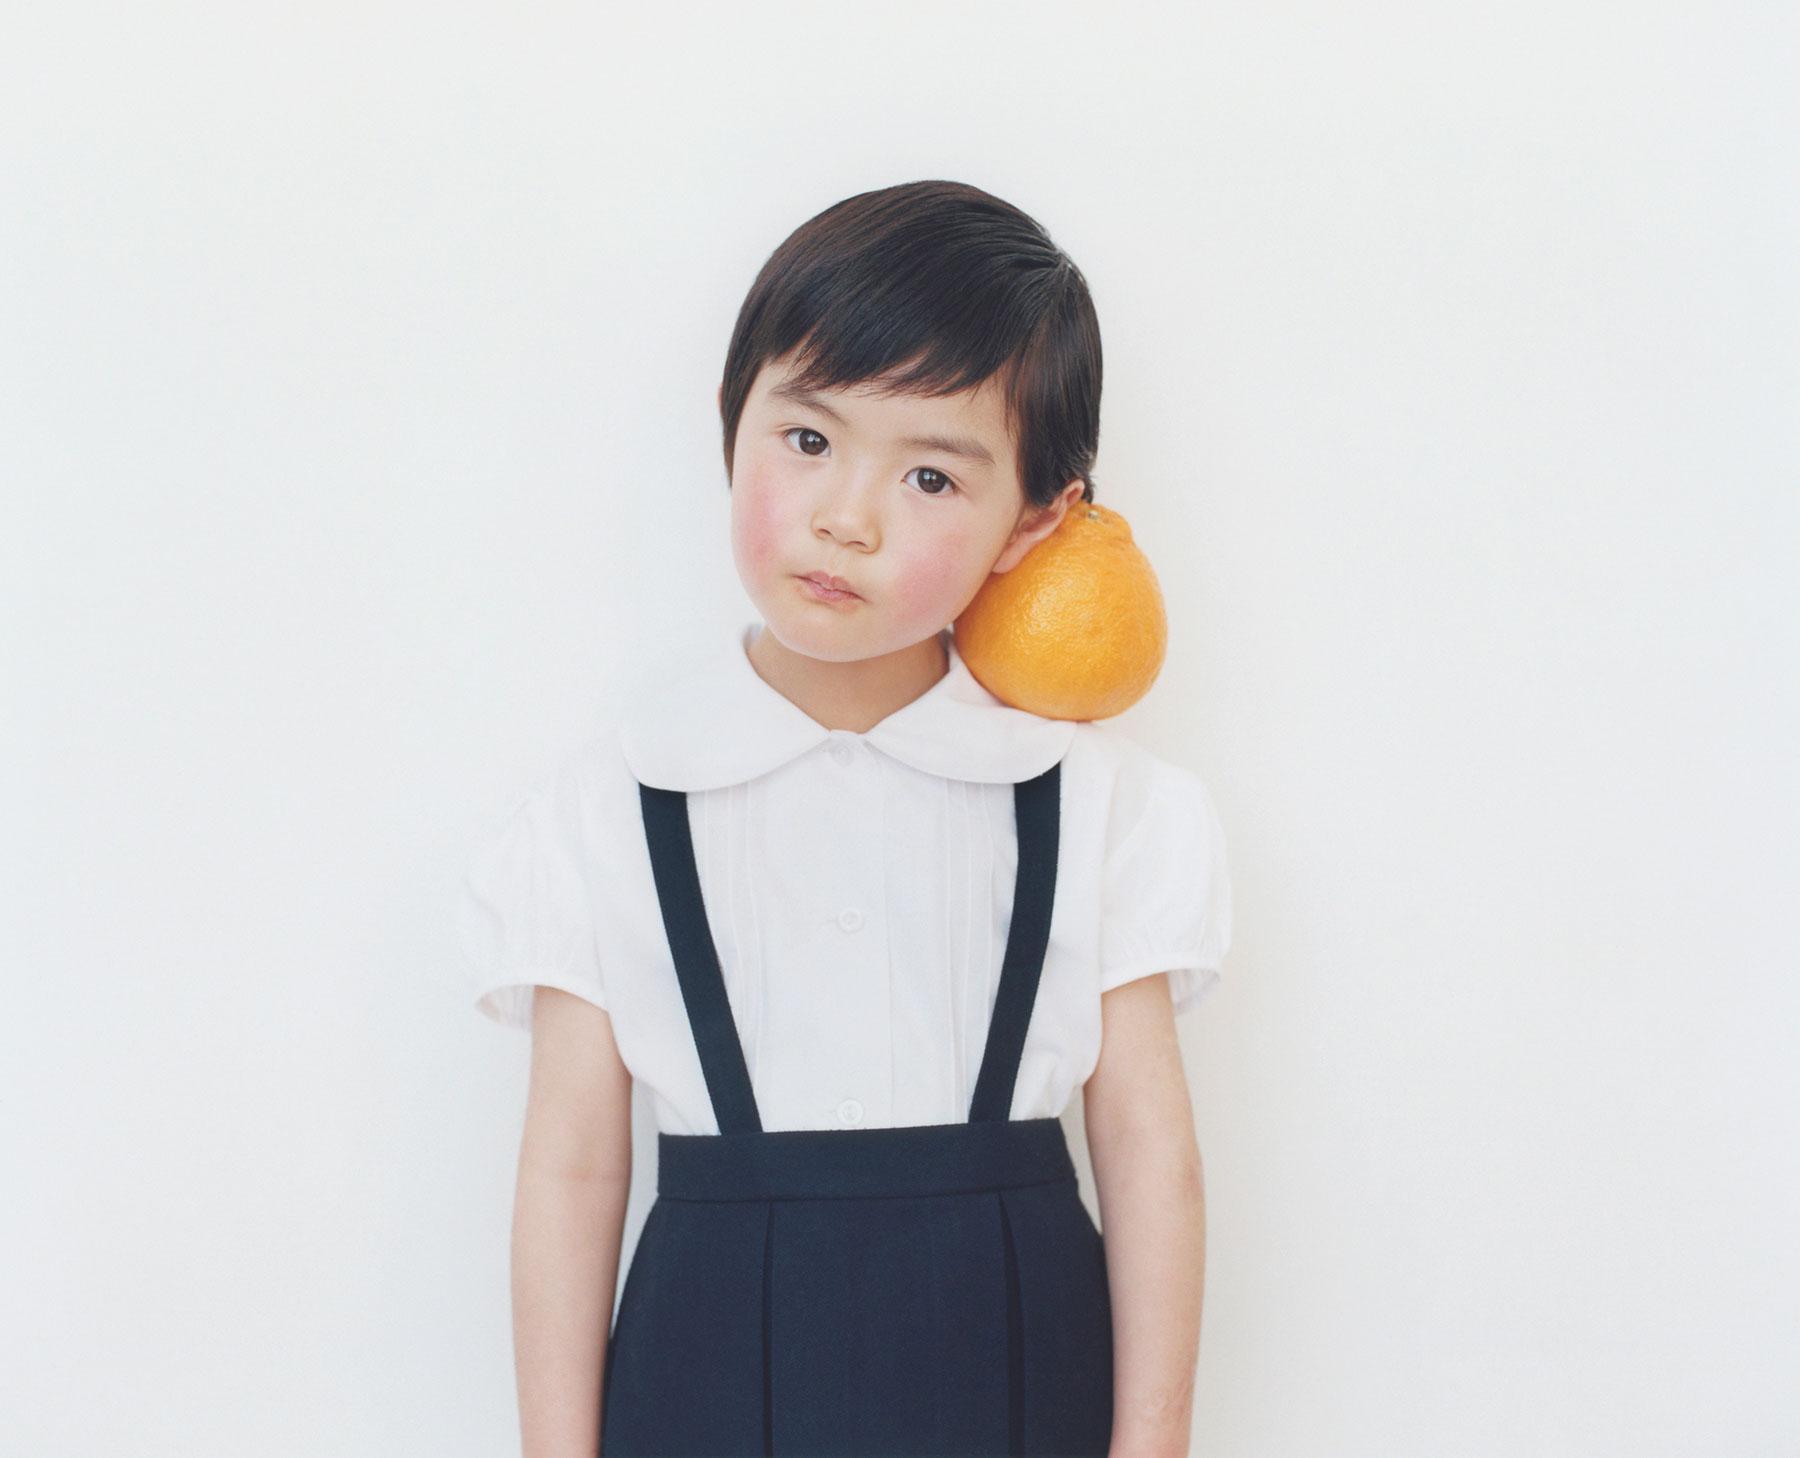 Osamu Yokonami,  1000 Children: Sumo Mandarin No. 17 , 2010-2013  Digital pigment print, 895 x 1105 mm (approx. 34.25 x 43.5 in), edition of 5; 146 x 168 mm (approx. 5.75 x 6.6 in), edition of 10   Inquire